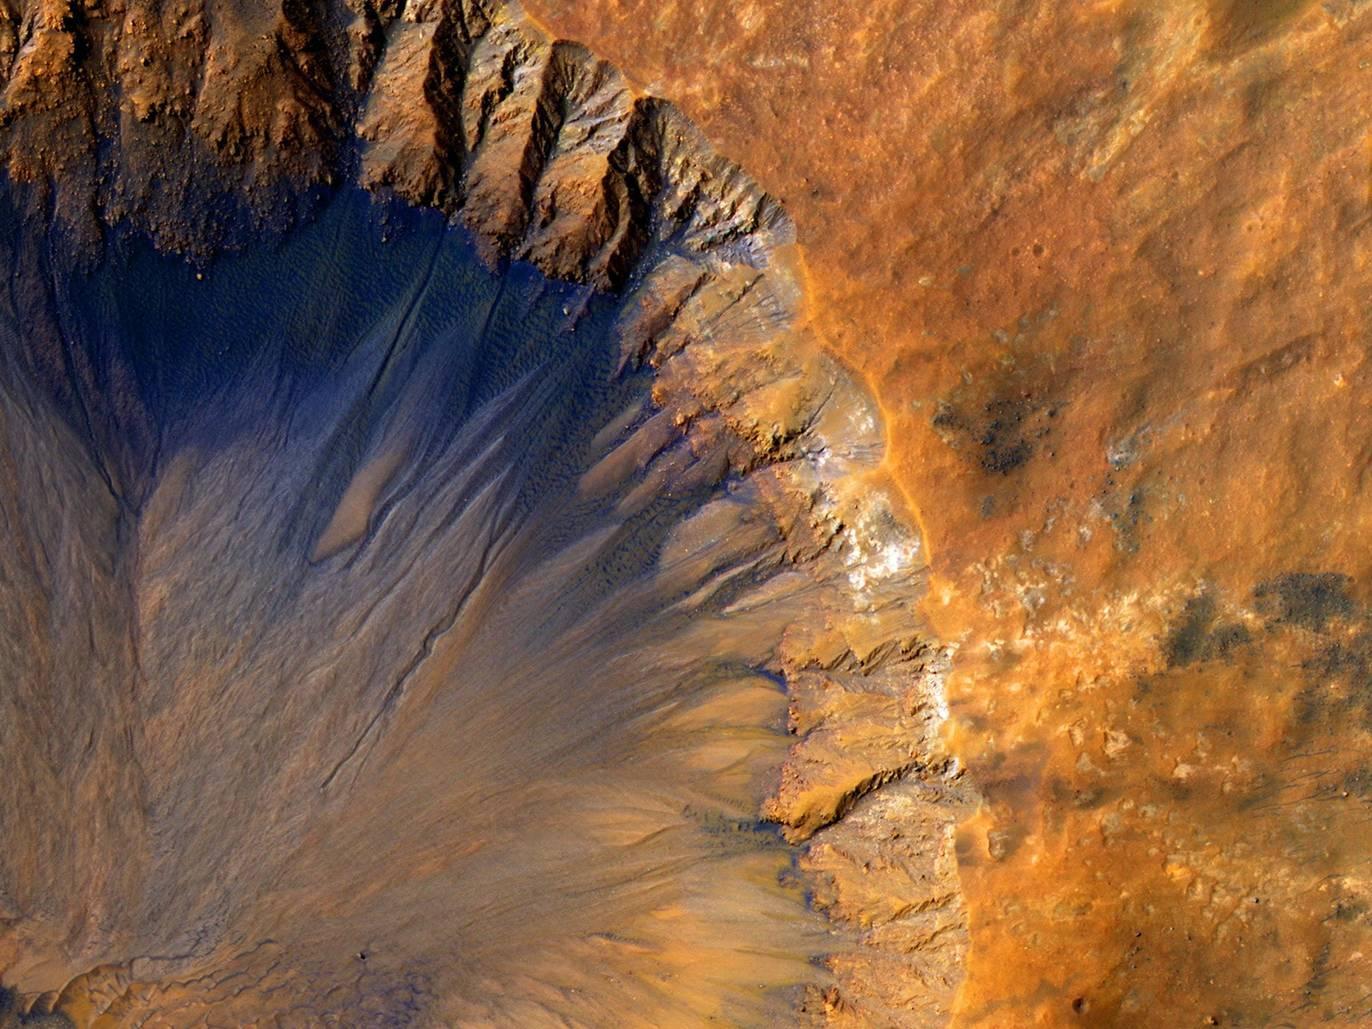 Photo: NASA/Unsplash